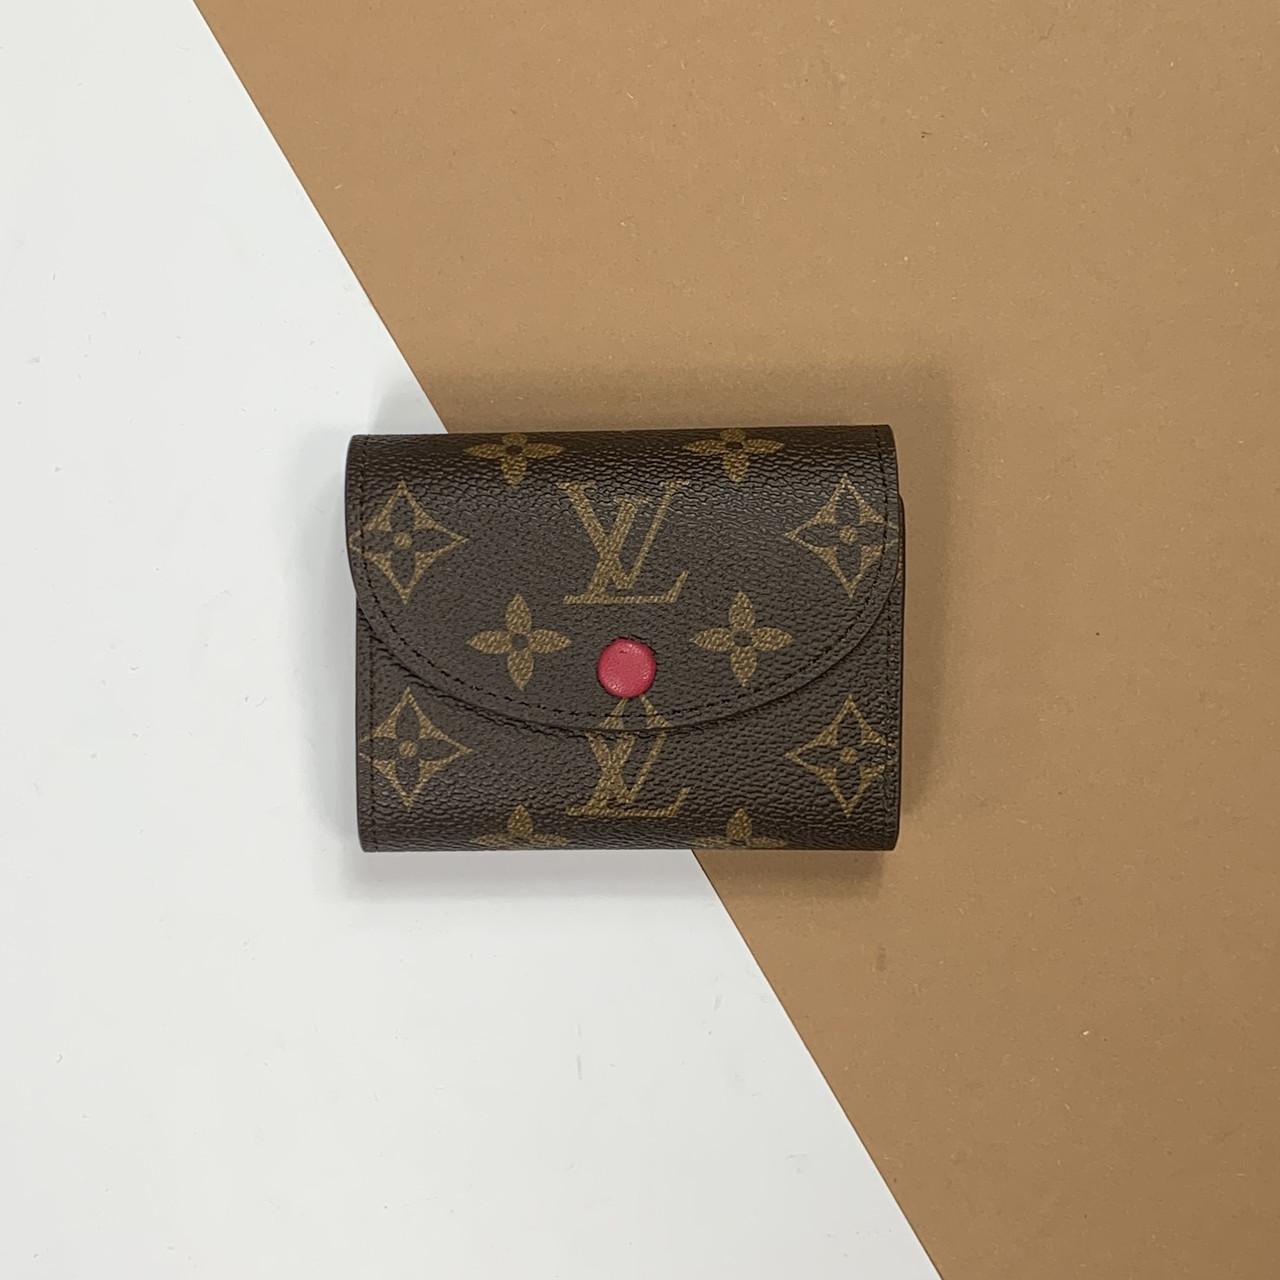 Кошелек Louis Vuitton ROSALIE (Луи Виттон) арт. 22-17